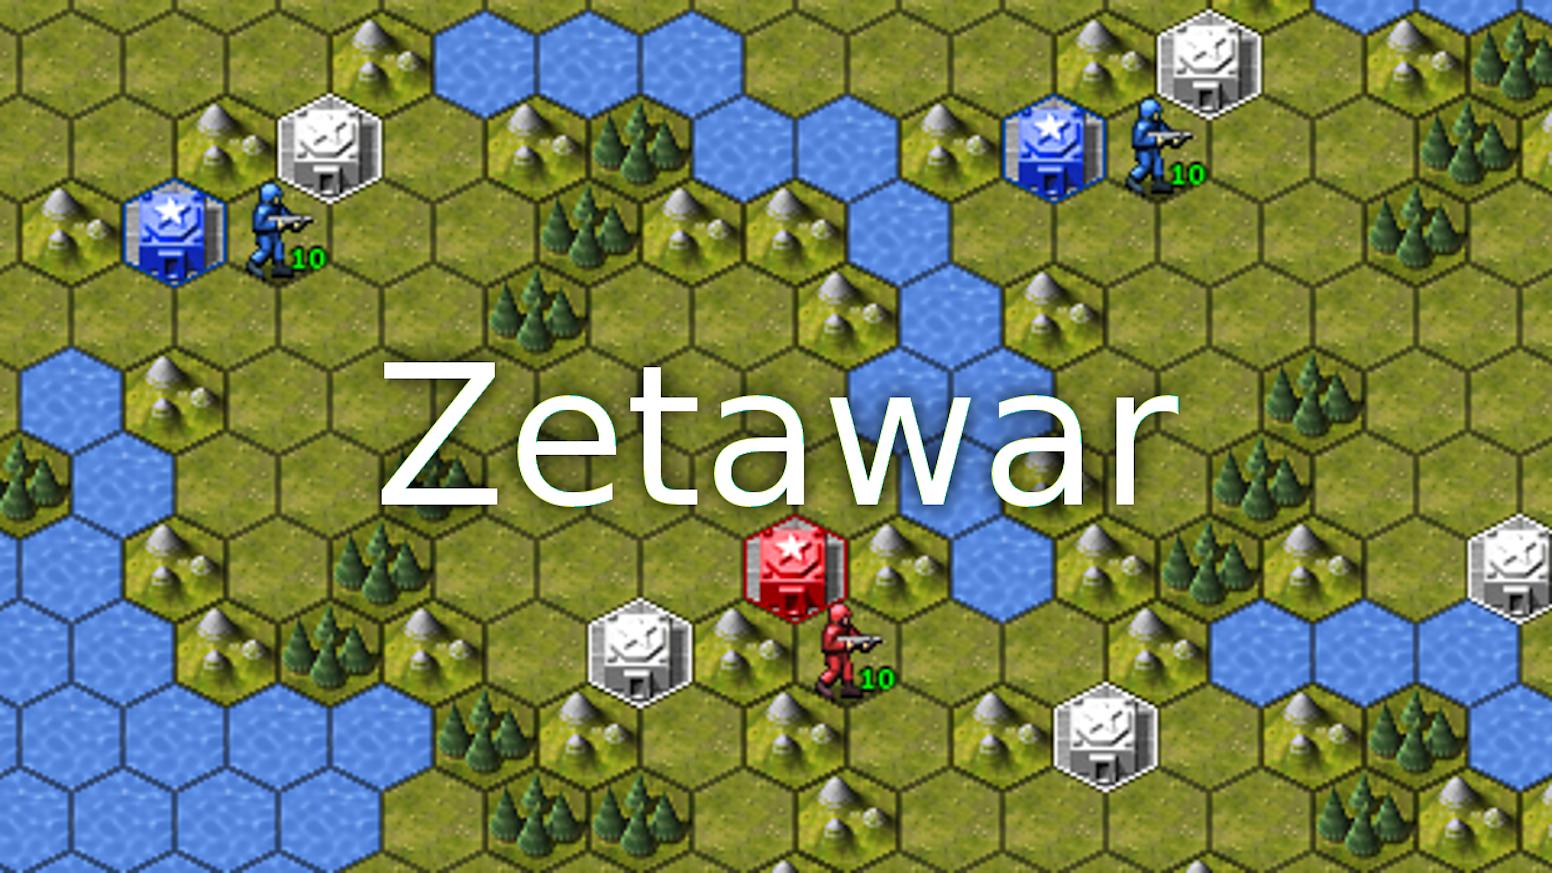 Zetawar by David Whittington » Code walkthrough feedback +